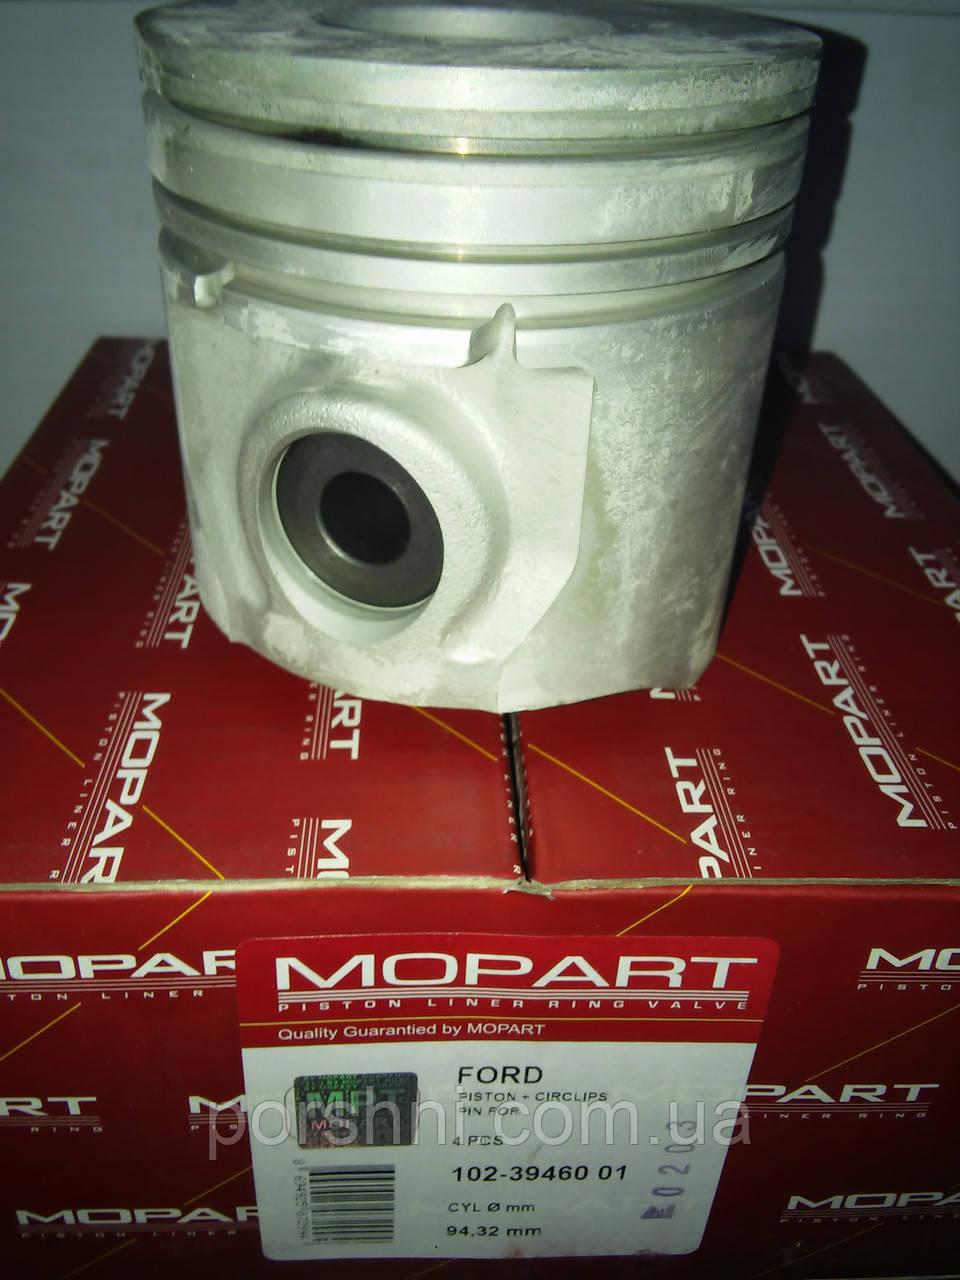 Поршневая  93.67 + 0.65 Ford Transit  2.5 D  89 --   2.5 x 2 x 4    Mopart 394601